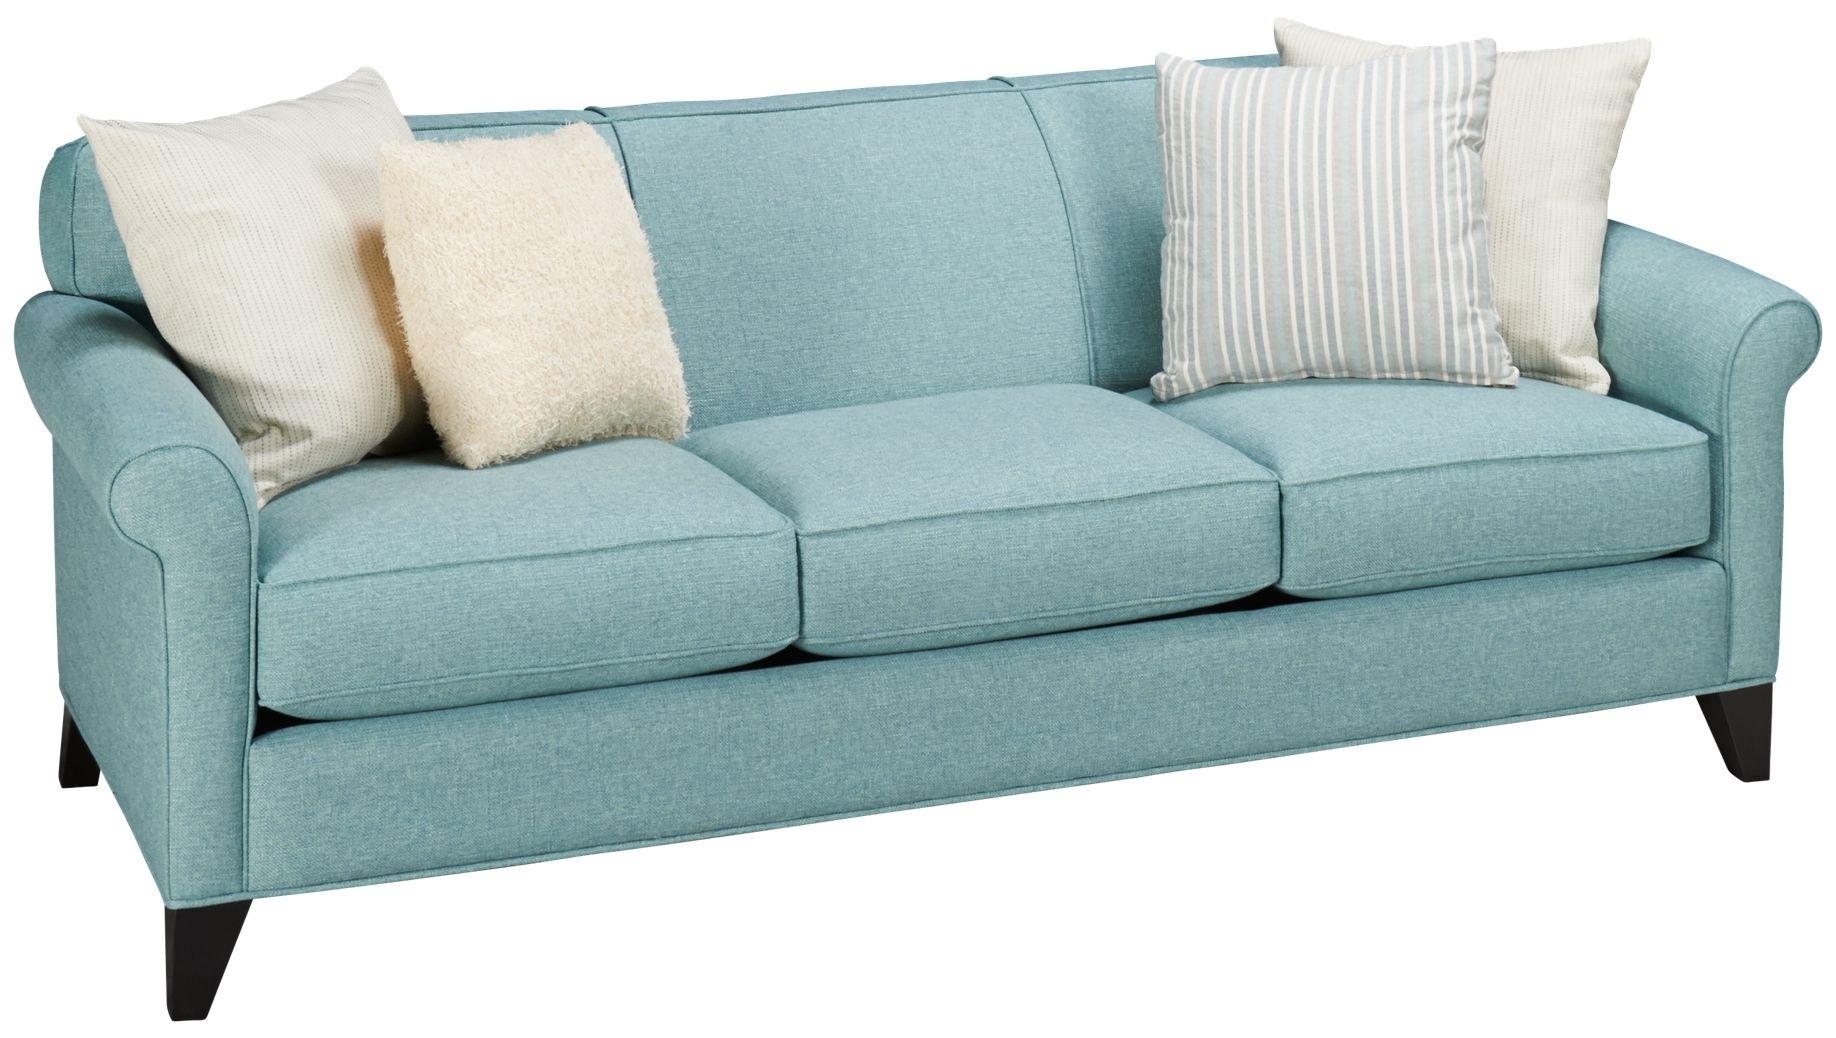 Jonathan Louis Selma Selma Sofa – Jordan's Furniture | Sofas With Jonathan Sofas (View 10 of 10)